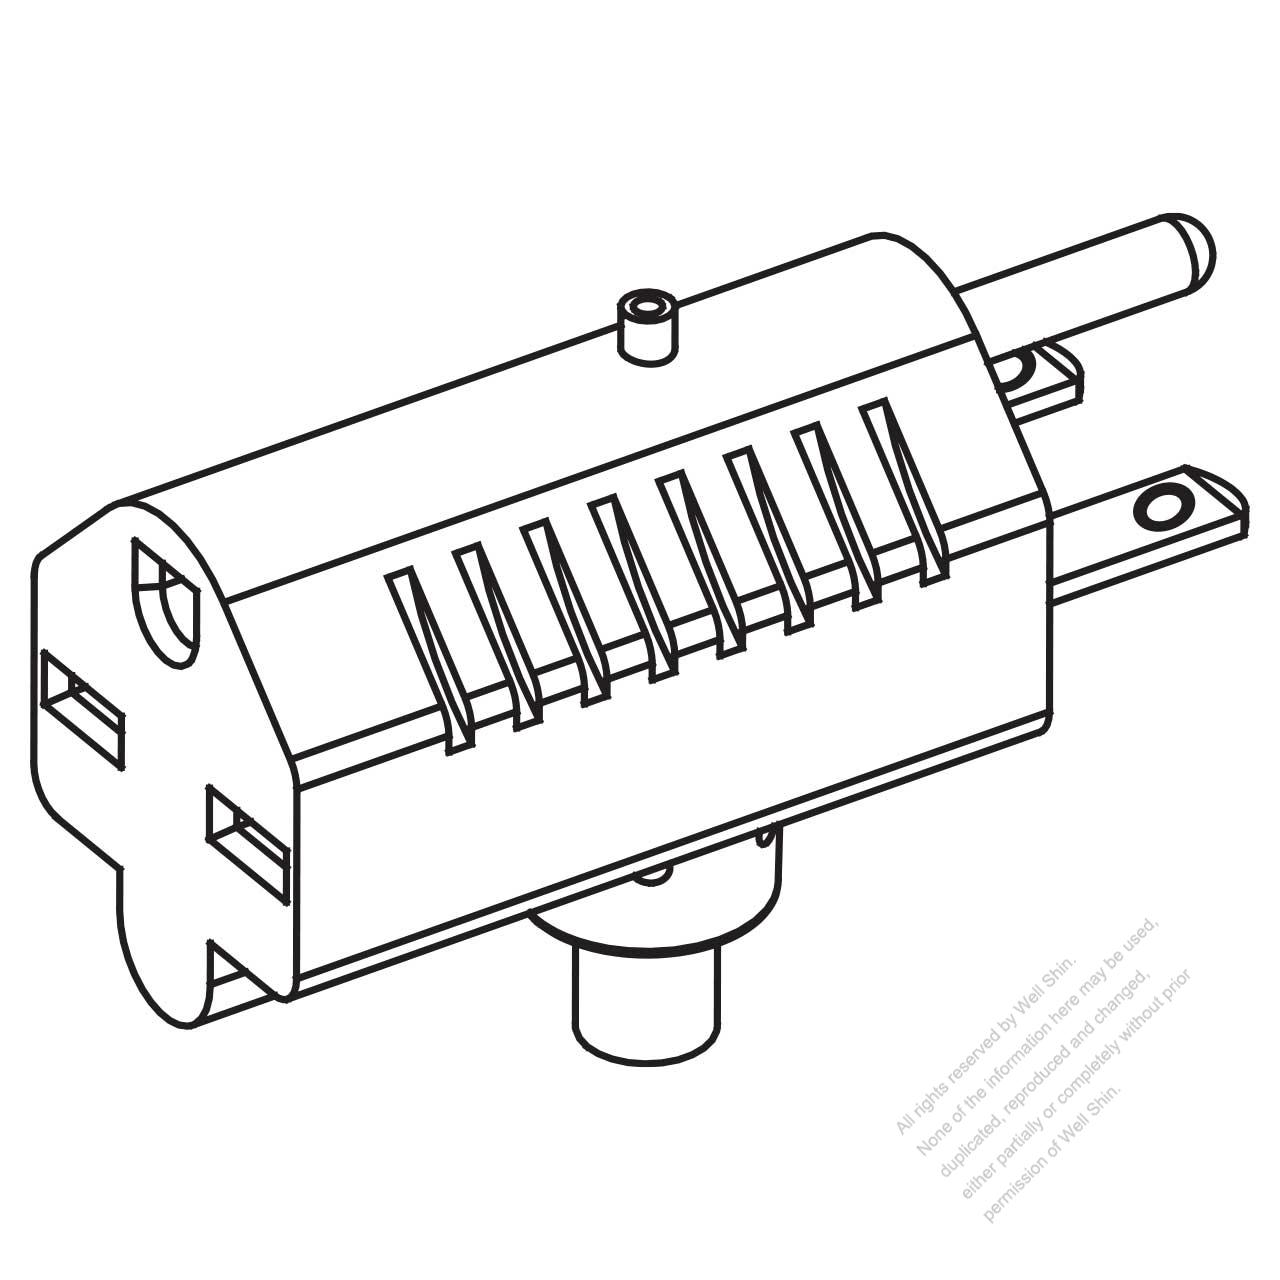 Nema 6 15p Plug Wiring Diagram | Wiring Liry Nema P Wiring Diagram on